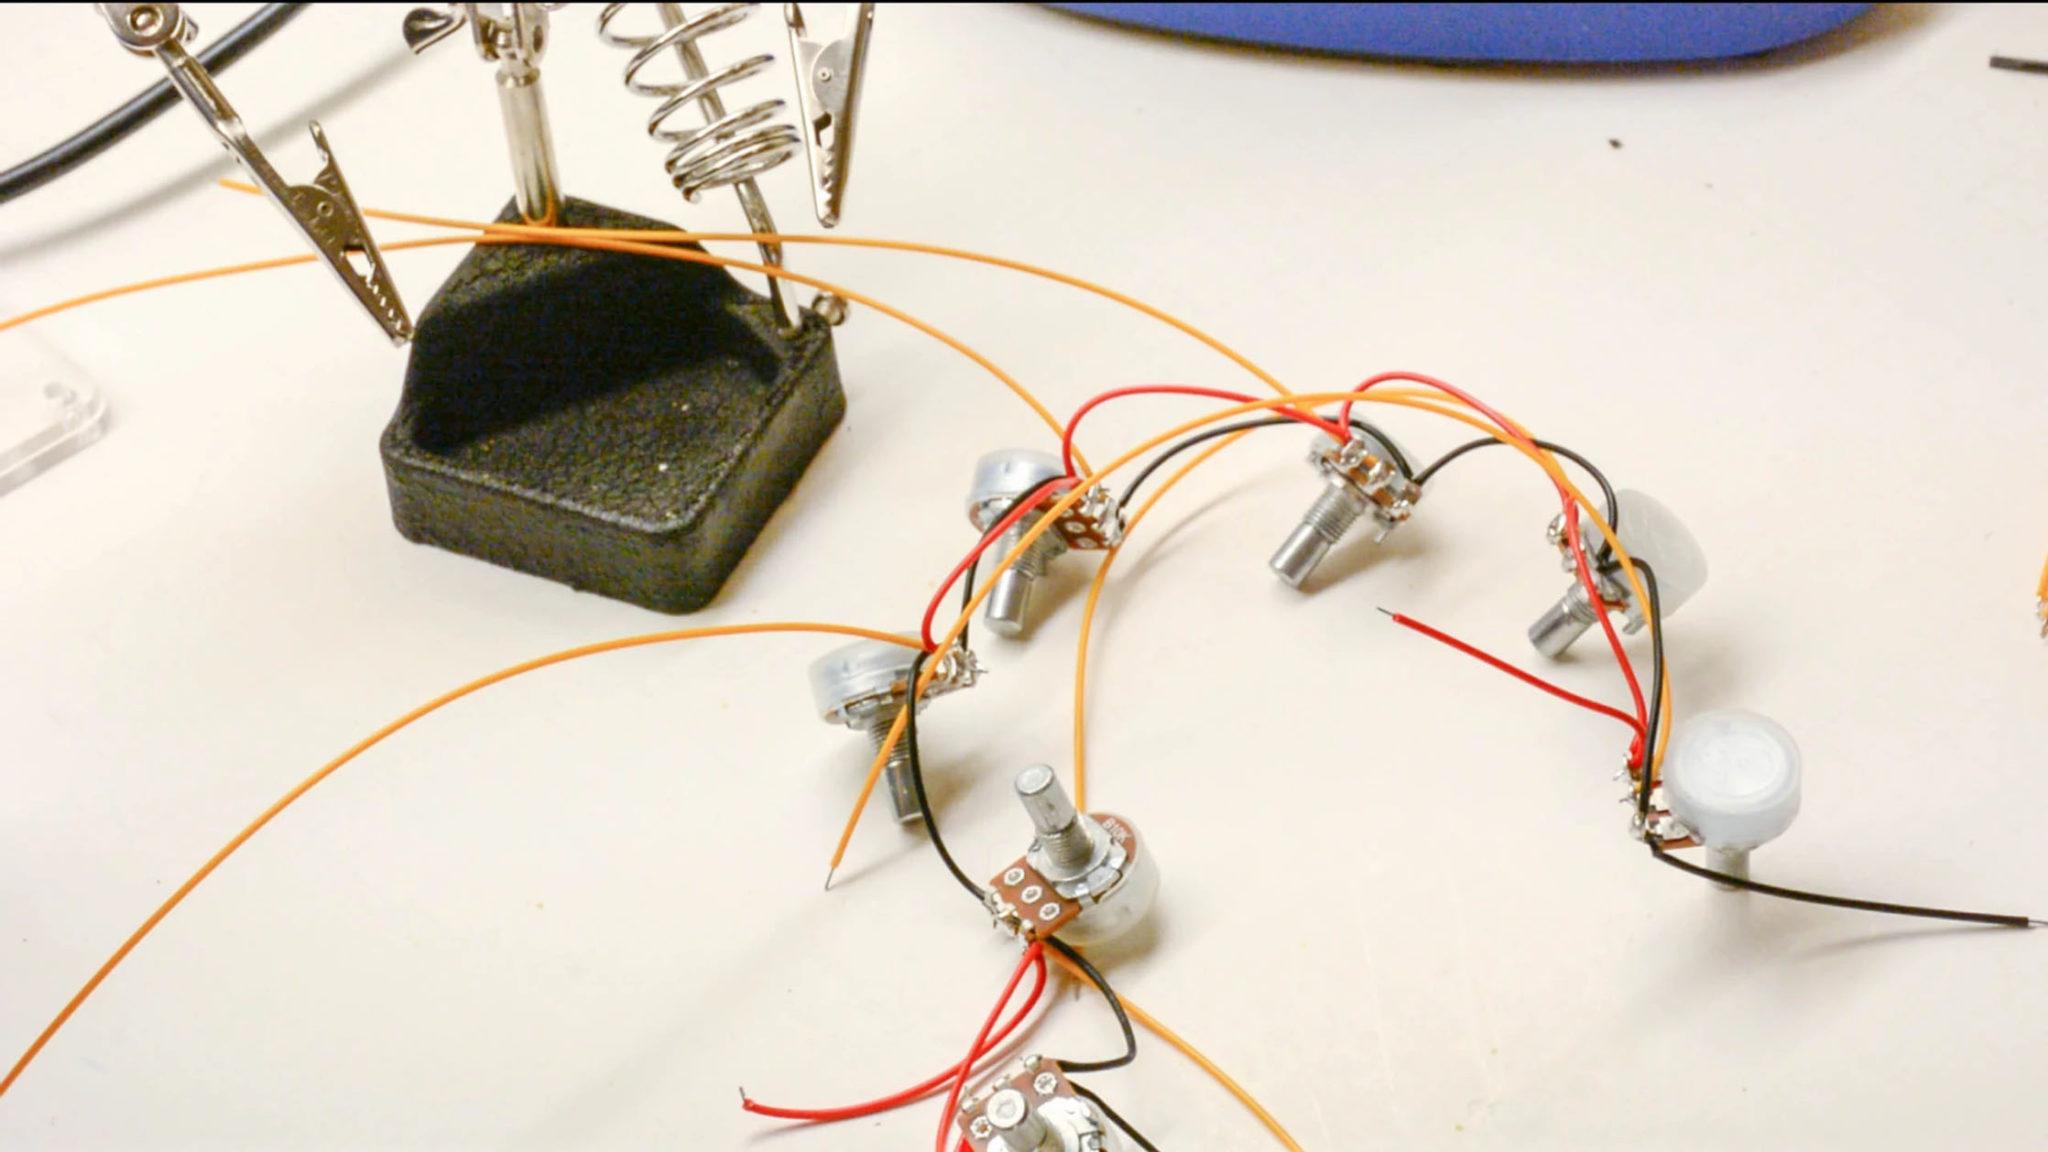 06-rotary-potentiometers